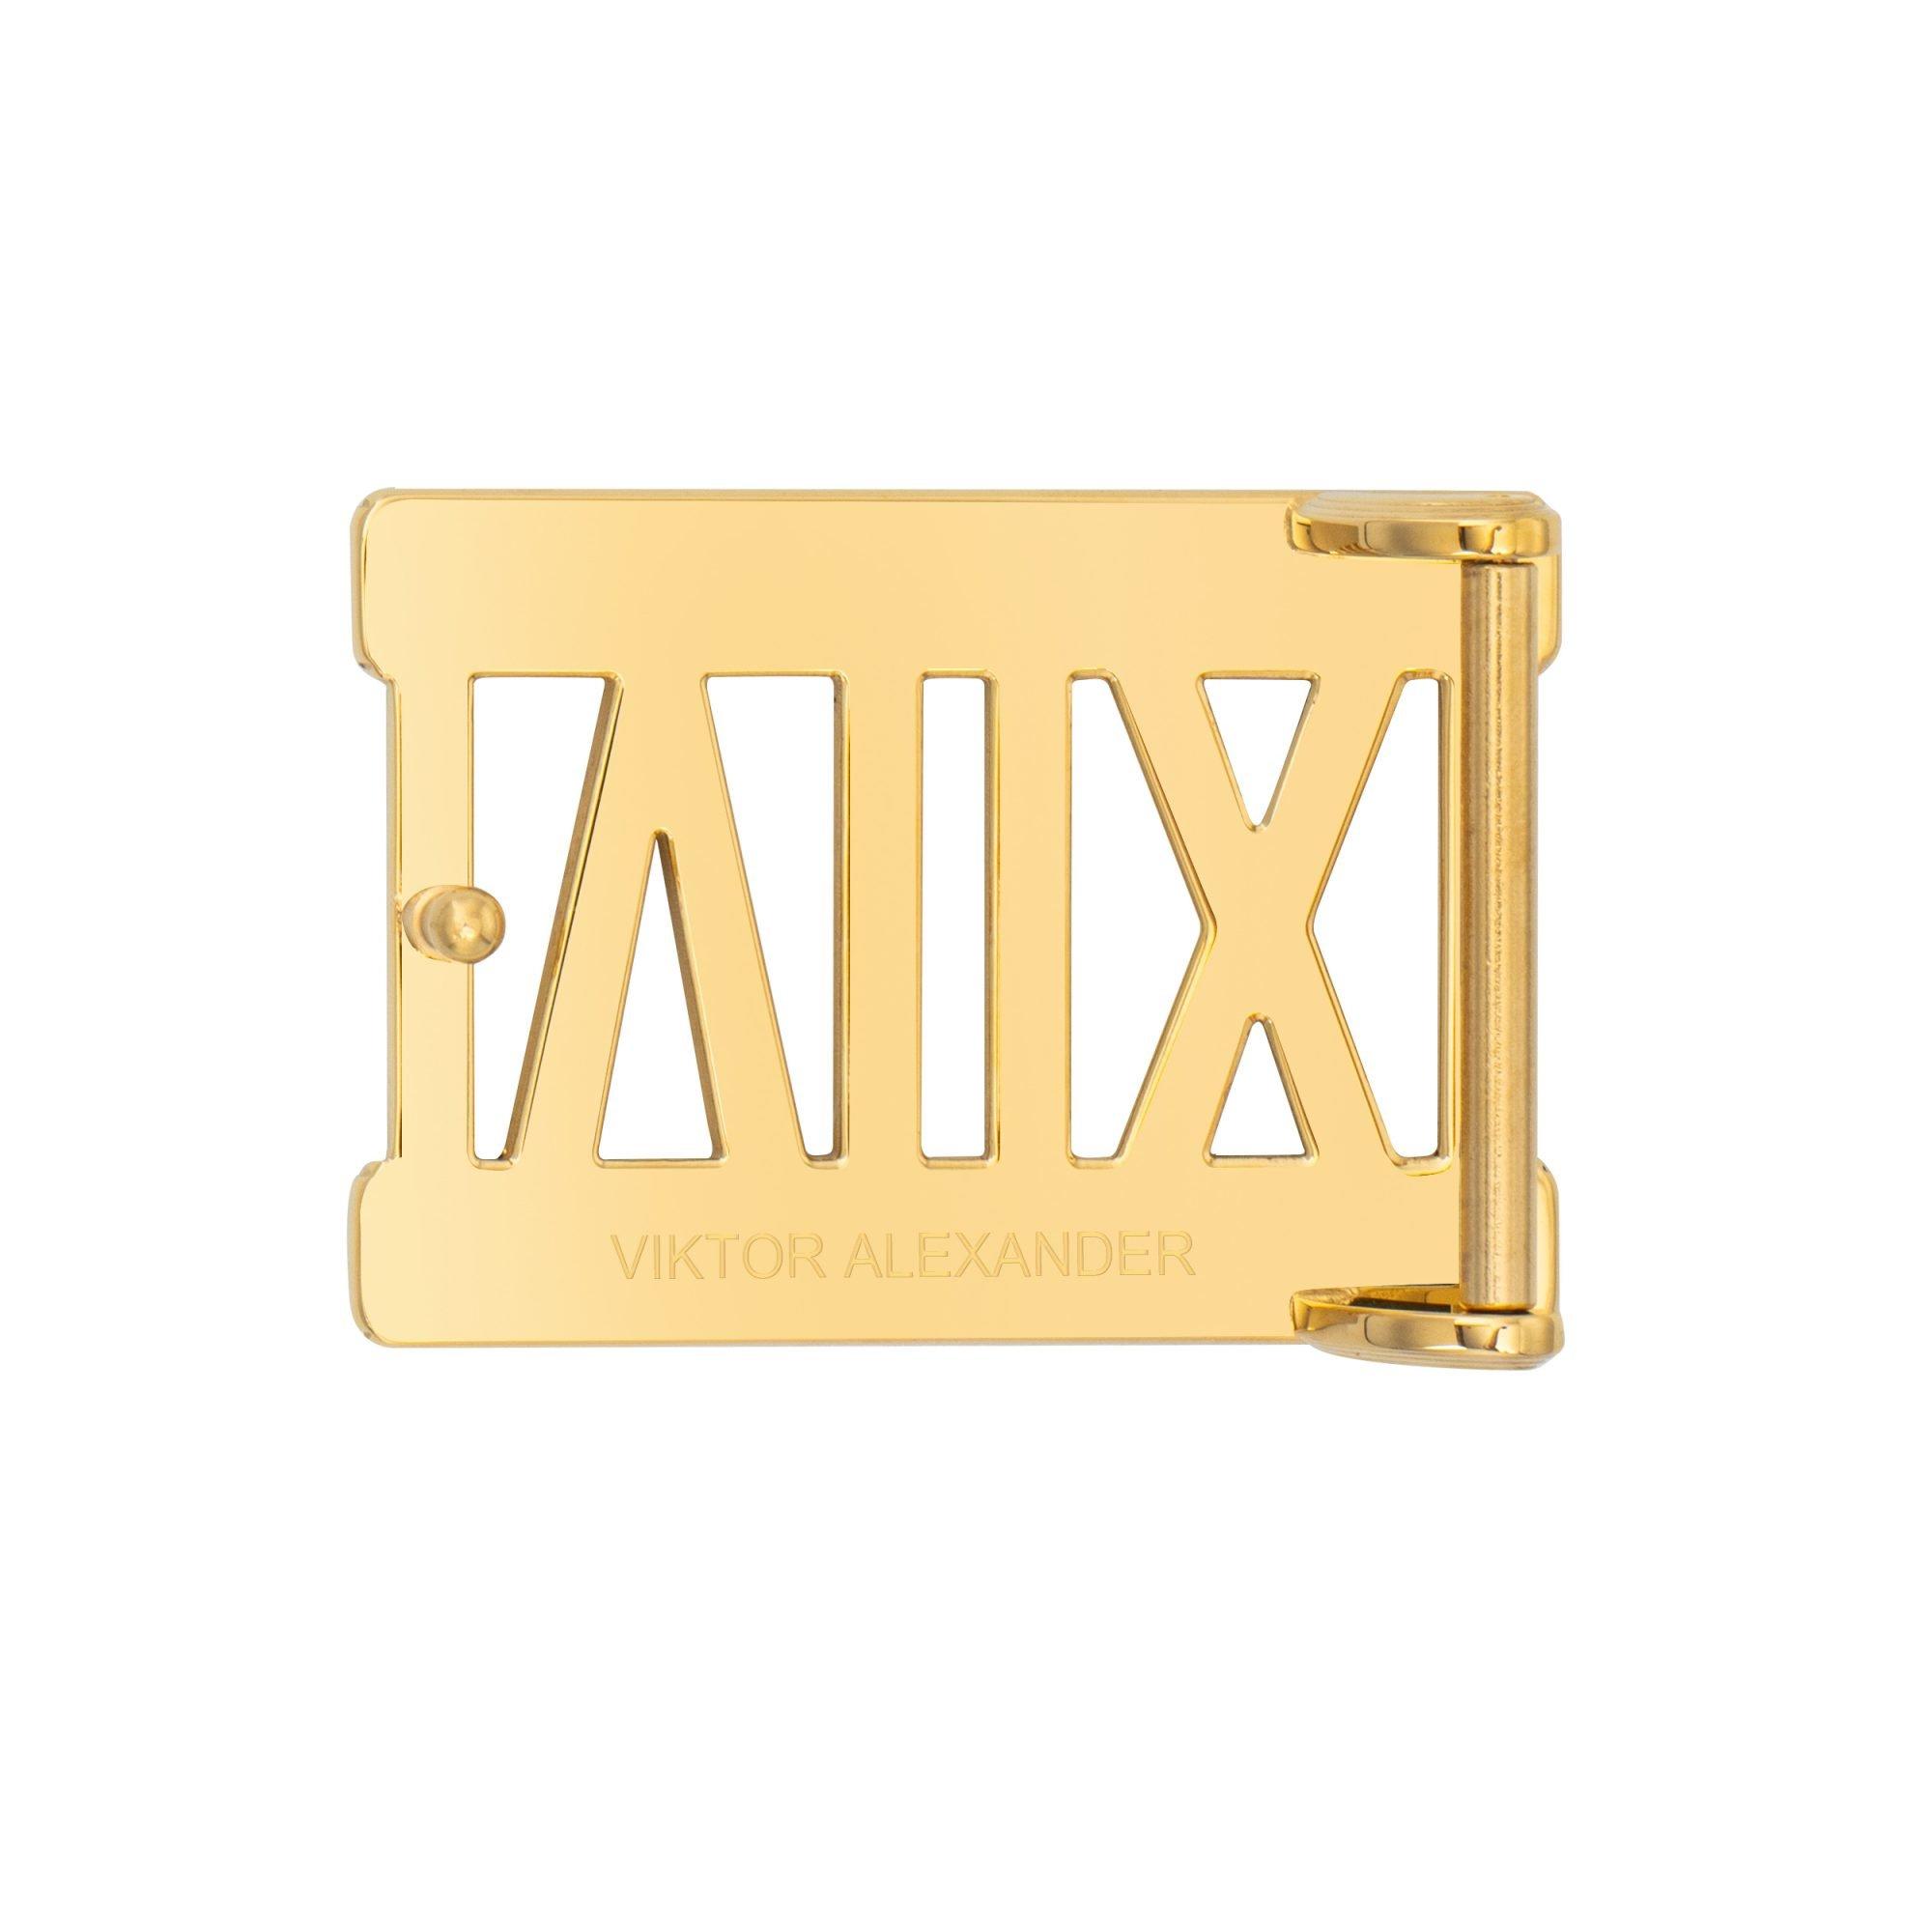 VIKTOR ALEXANDER 38MM STAINLESS STEEL BELT BUCKLE ROMAN NUMERALS YELLOW GOLD BACK PROFILE